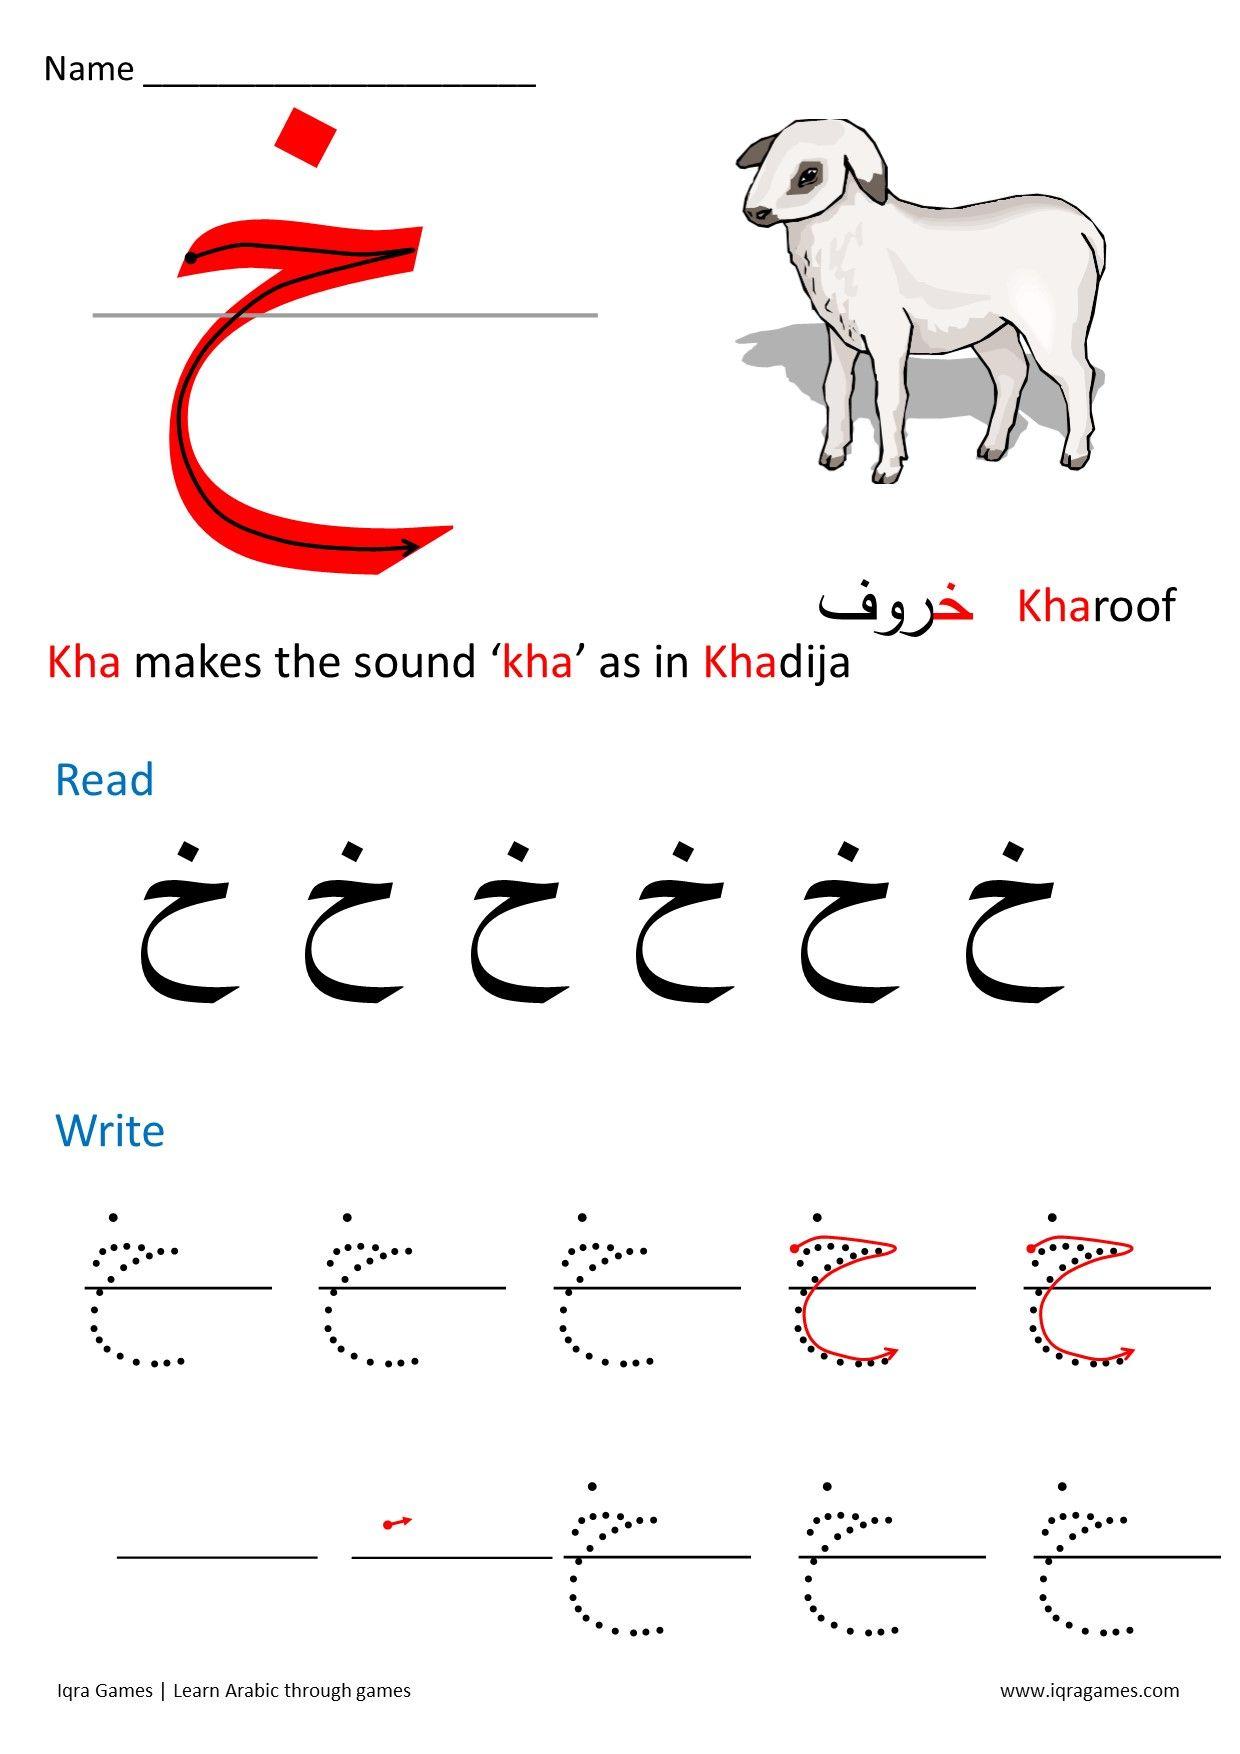 arabic letter formation iqra games alphabet learn arabic alphabet learning arabic letter. Black Bedroom Furniture Sets. Home Design Ideas